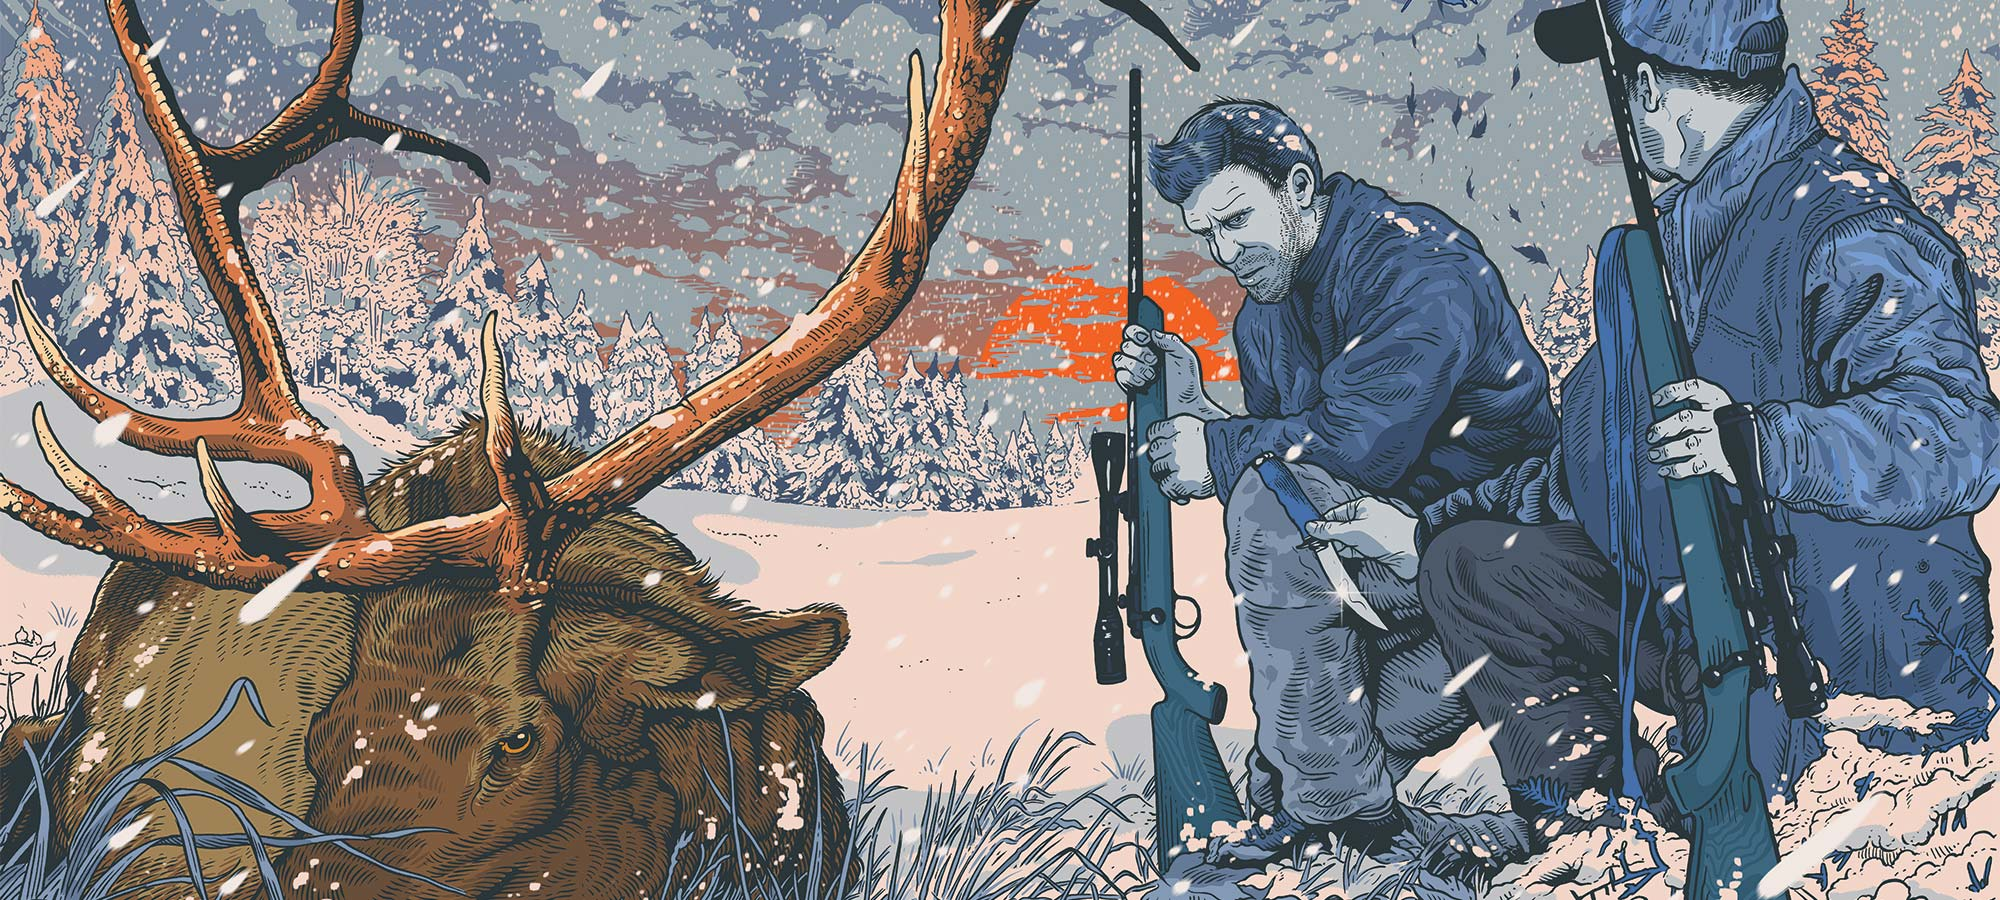 david petazal's life through hunting knives